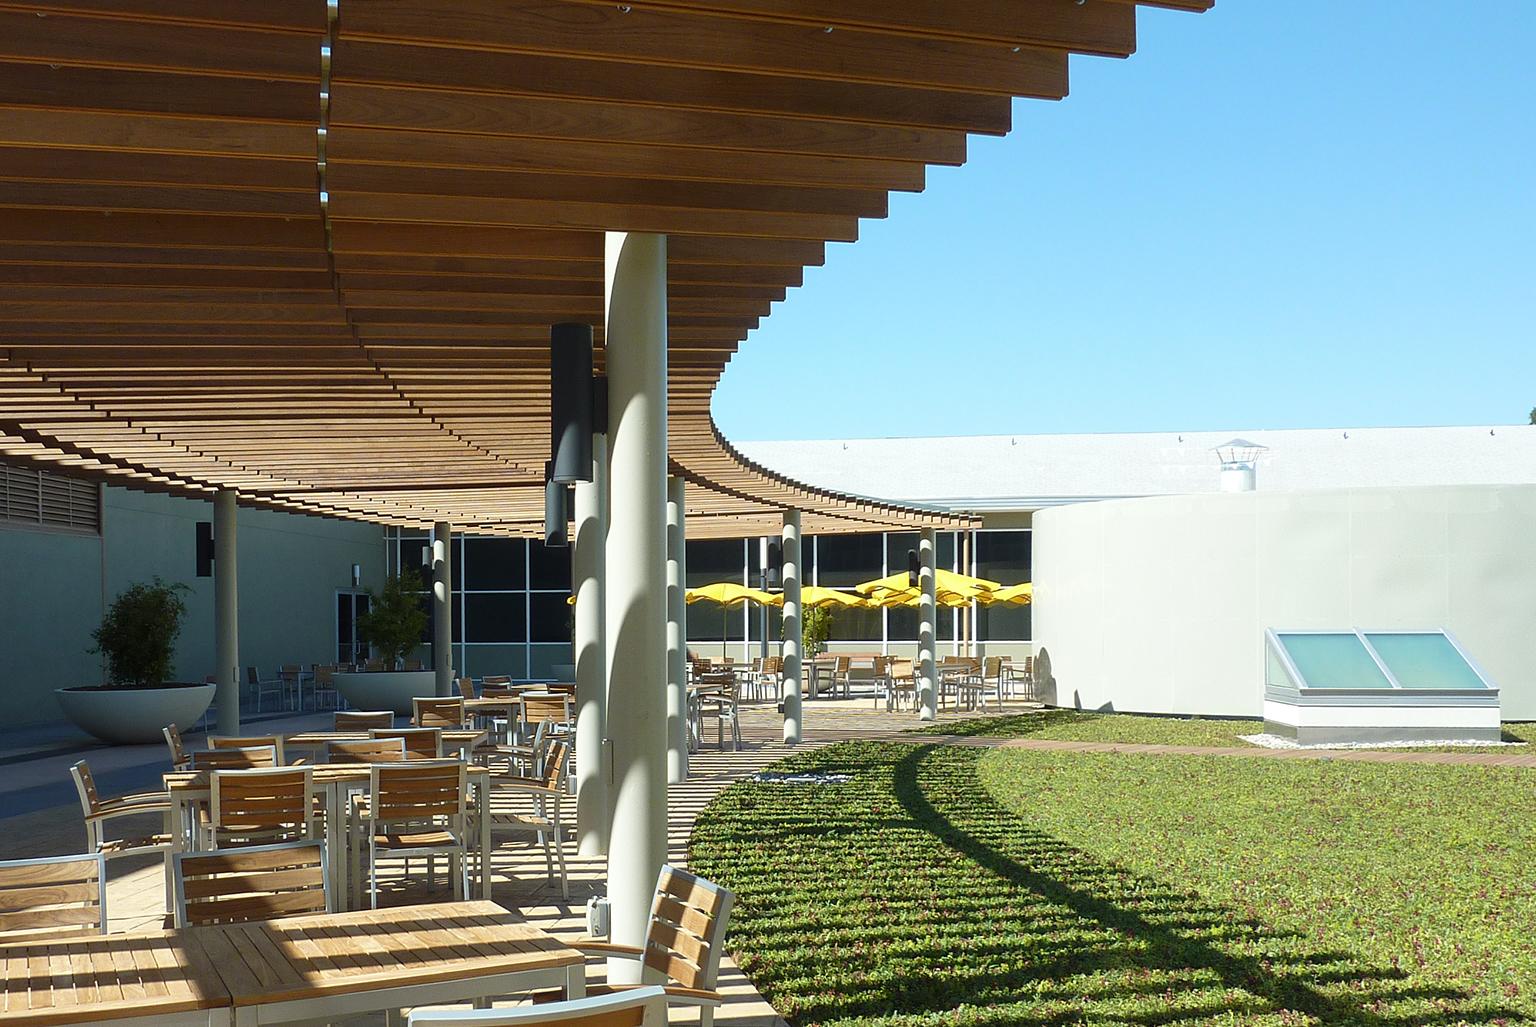 International Technology Campus, Green Roof